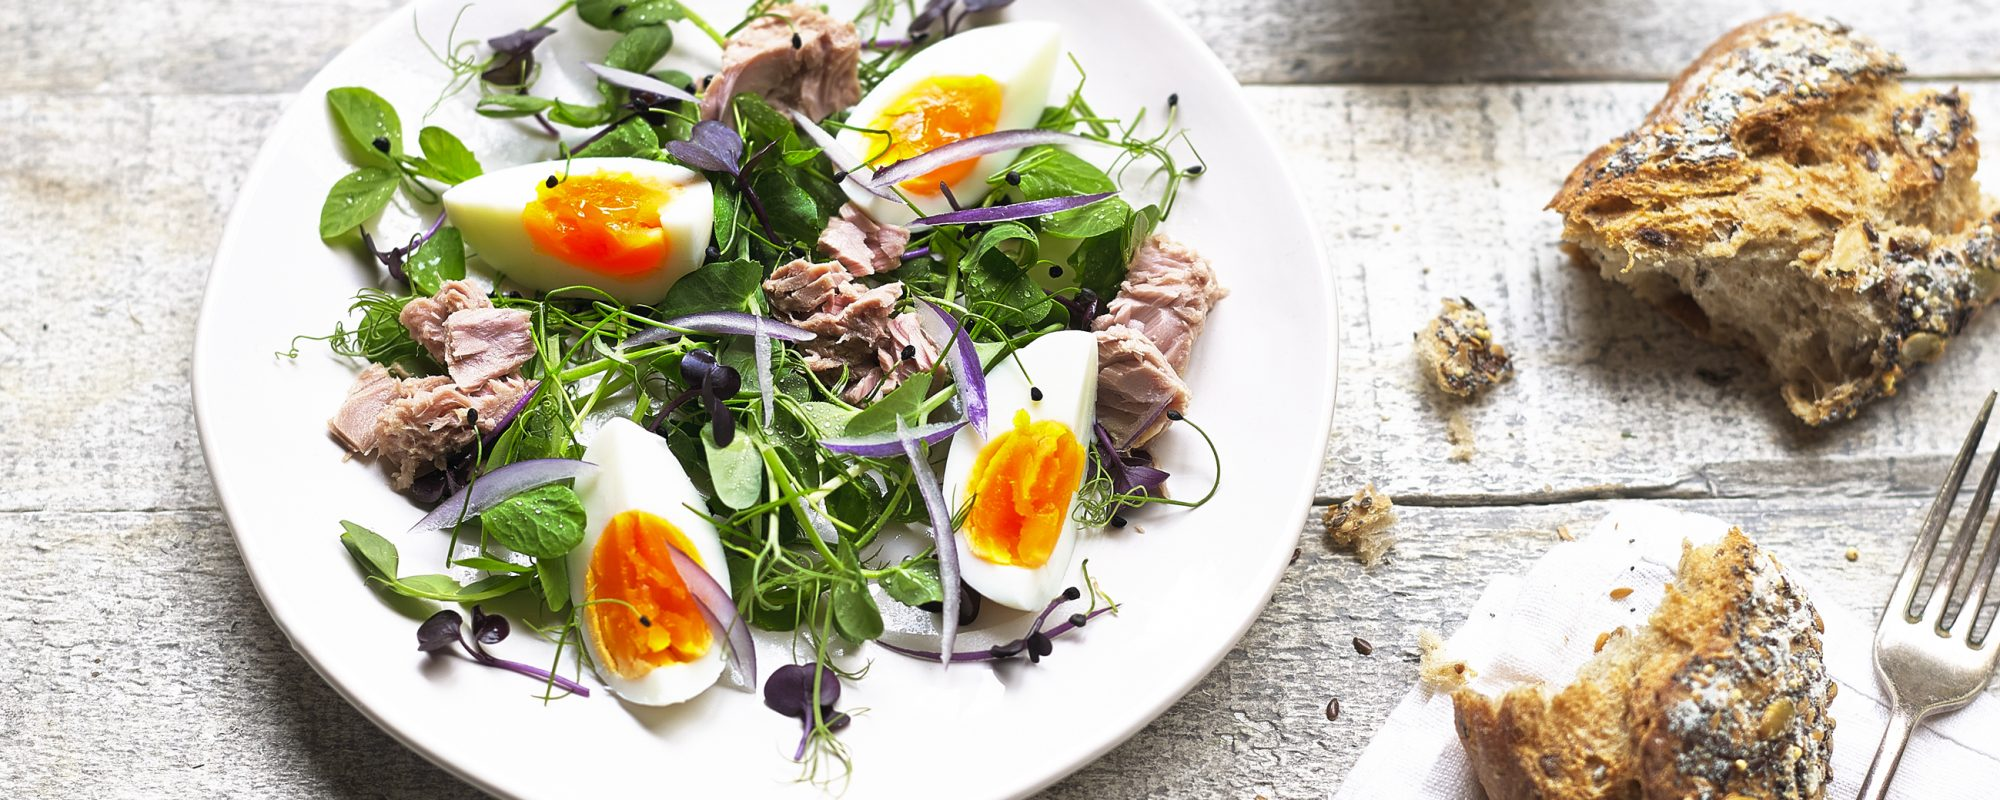 The Best Pea Shoots & Tuna Salad